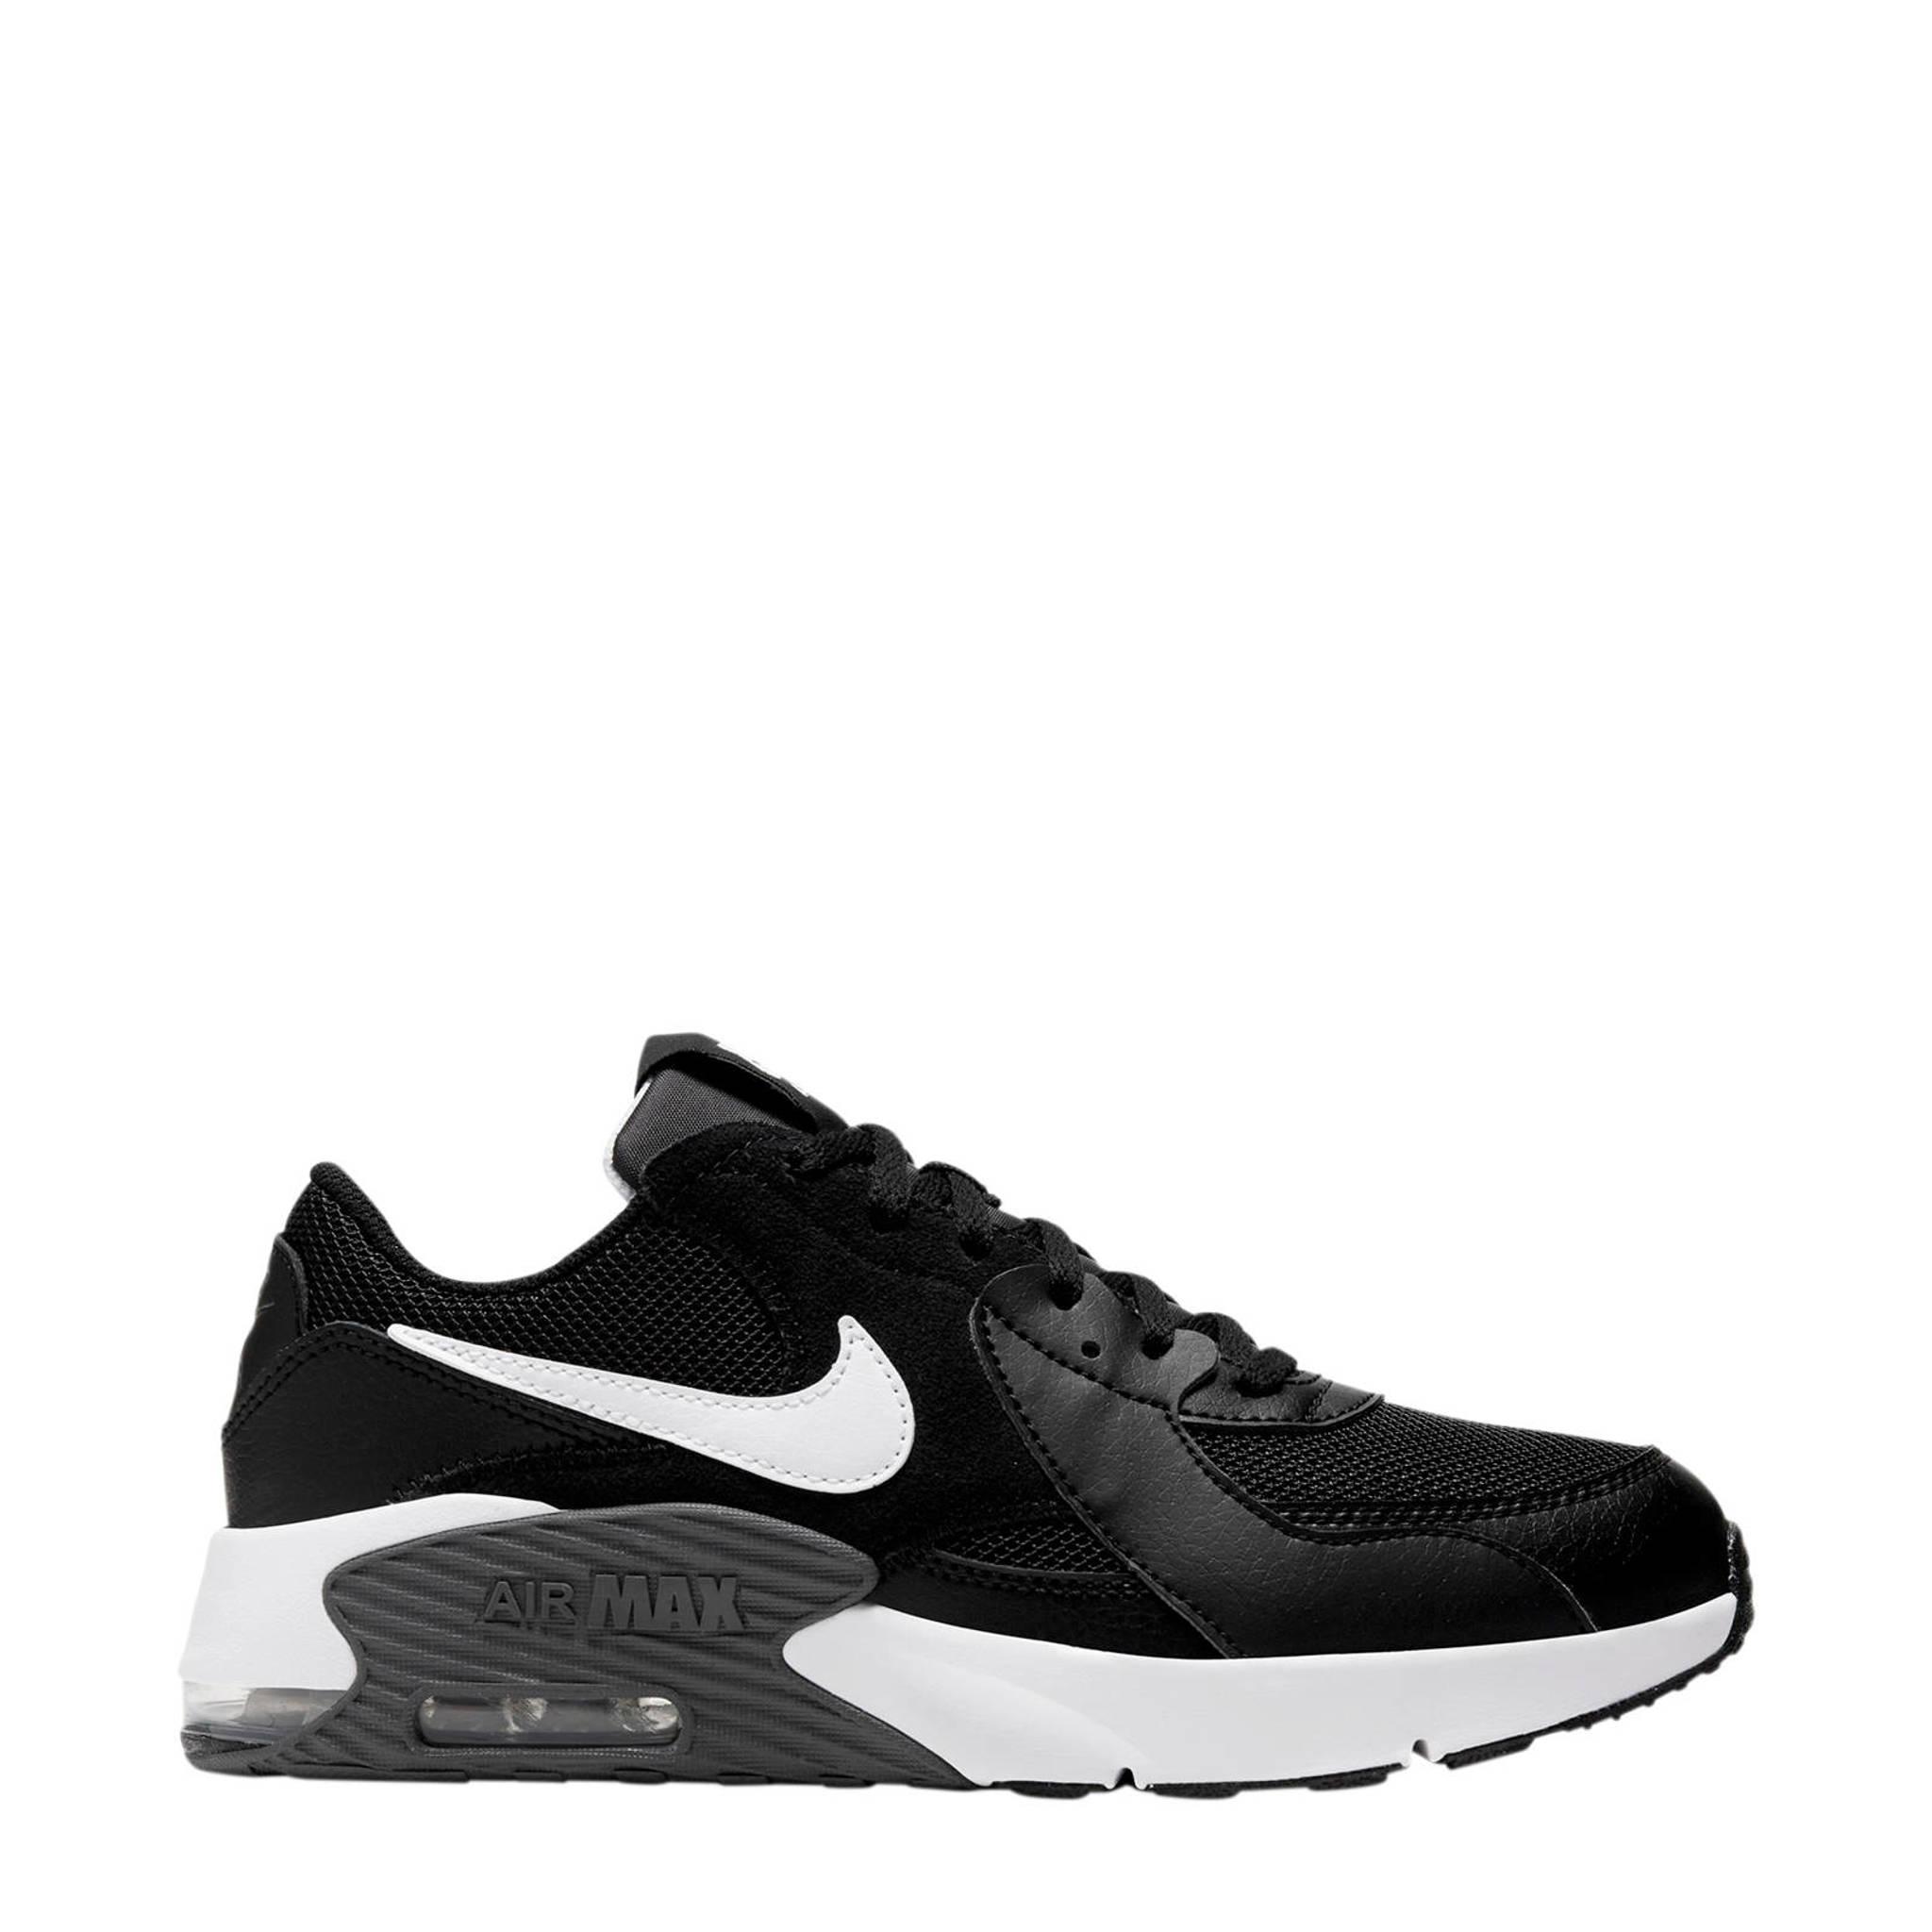 Nike Air Max zwart